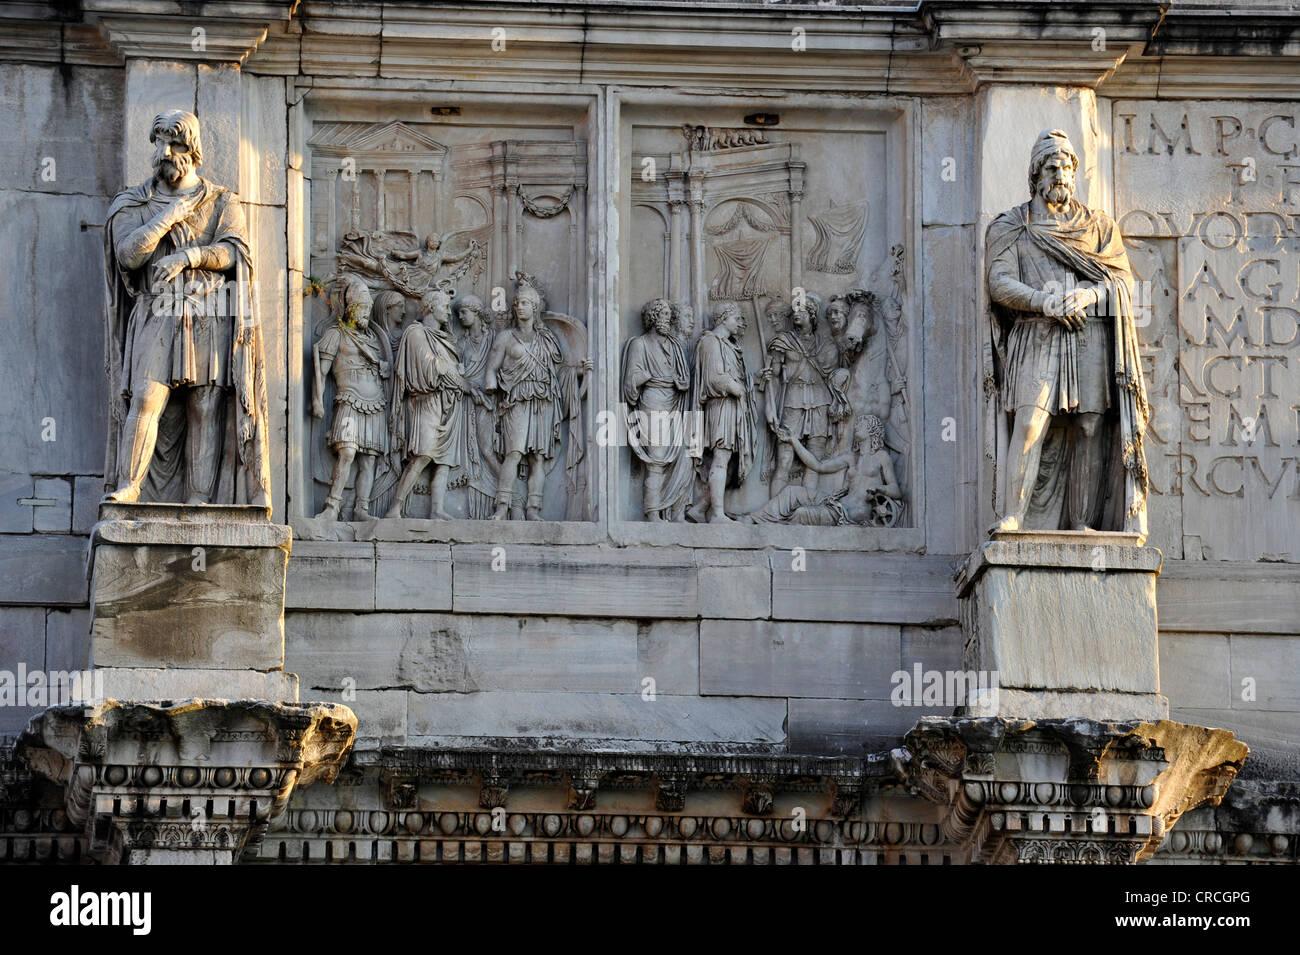 Statue of a Dacian prisoners and attic reliefs on the Arch of Constantine, Piazza del Colosseo, Rome, Lazio, Italy, - Stock Image